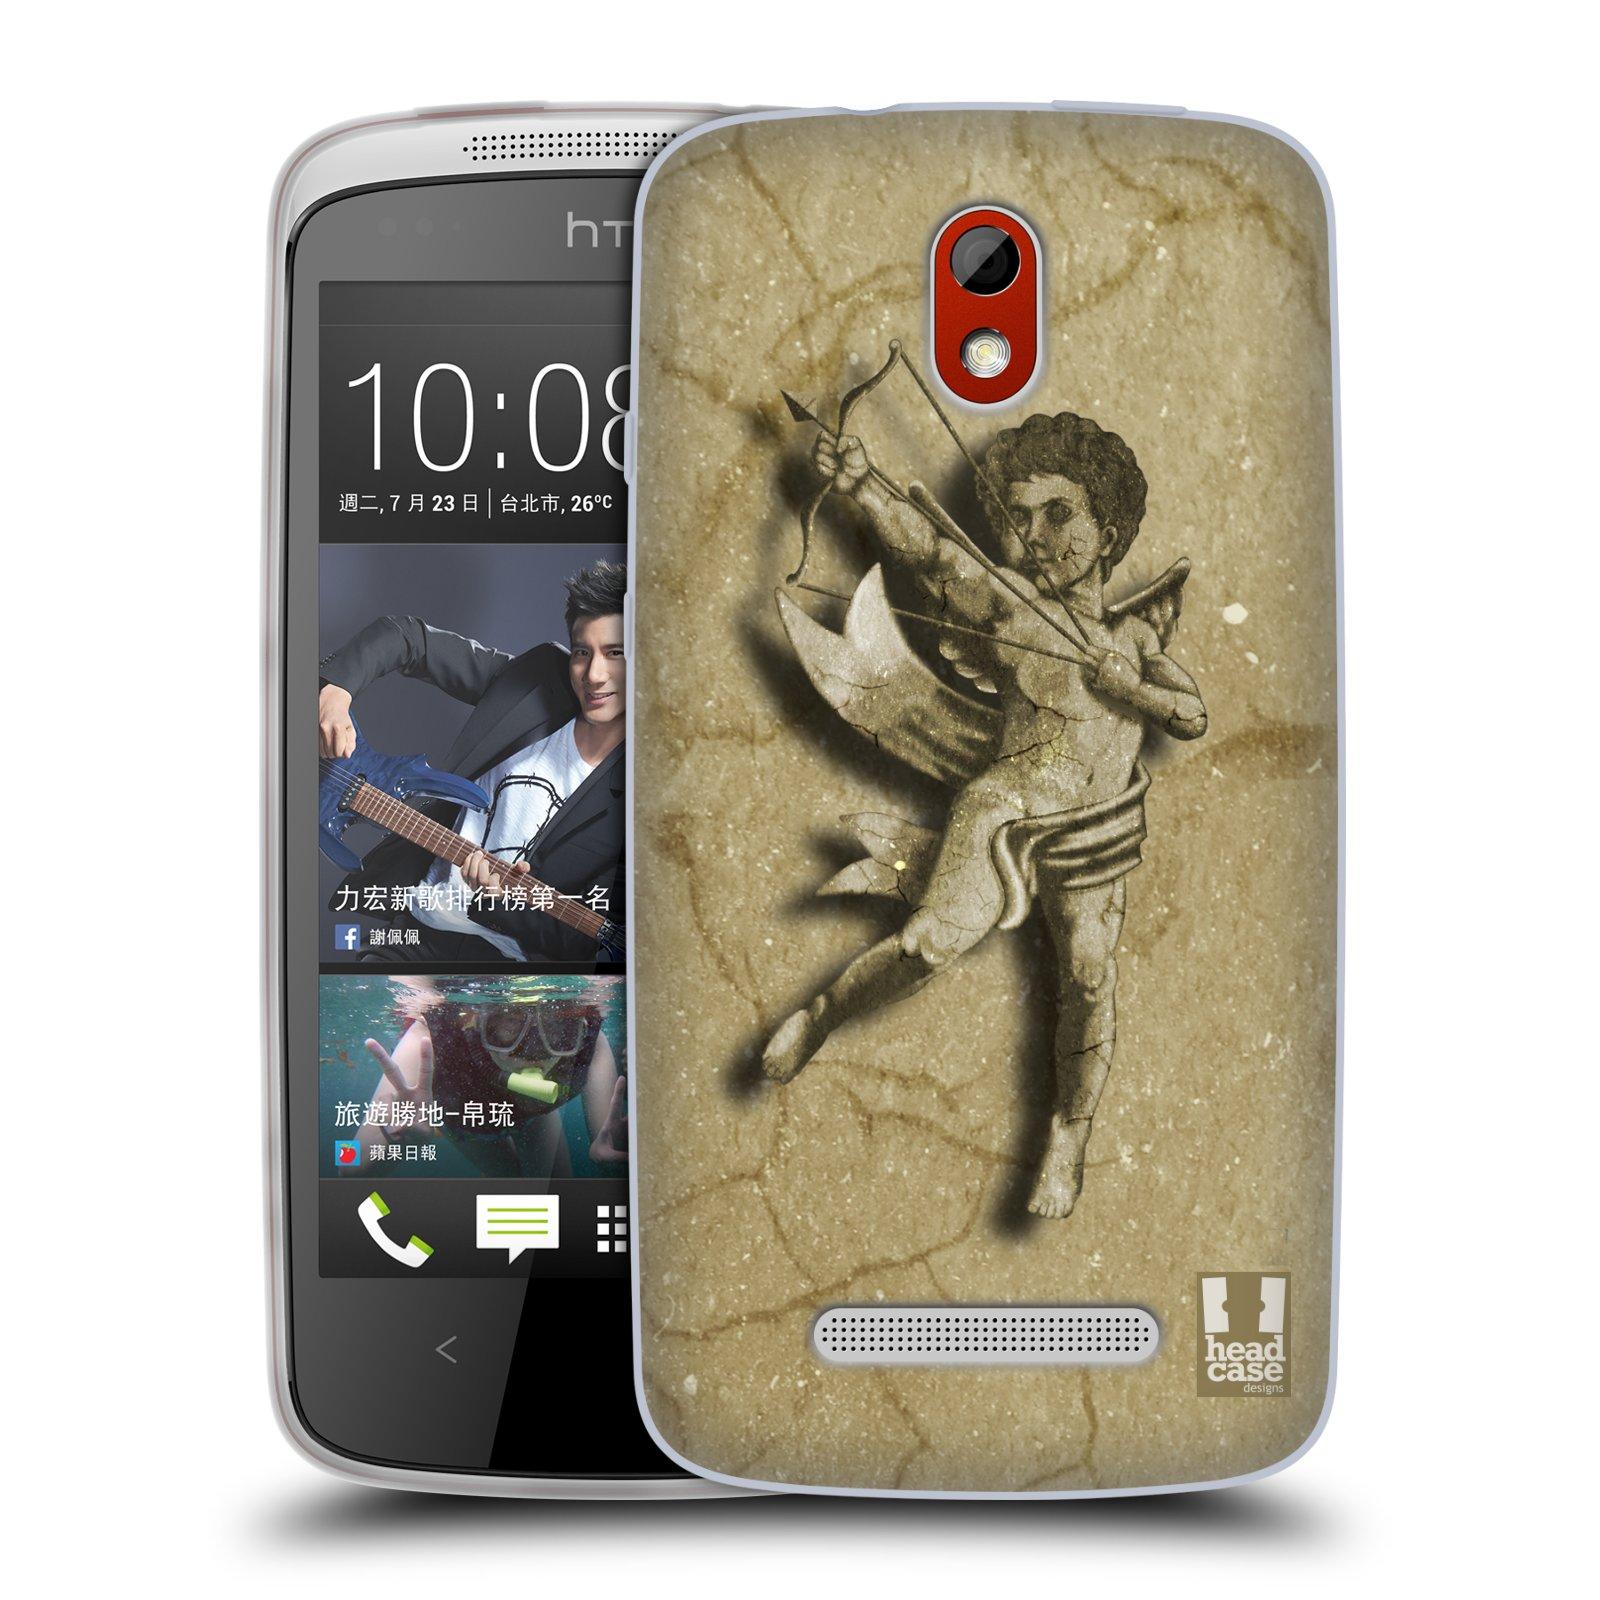 HEAD CASE silikonový obal na mobil HTC DESIRE 500 vzor Andělé z kamene LANCELOT